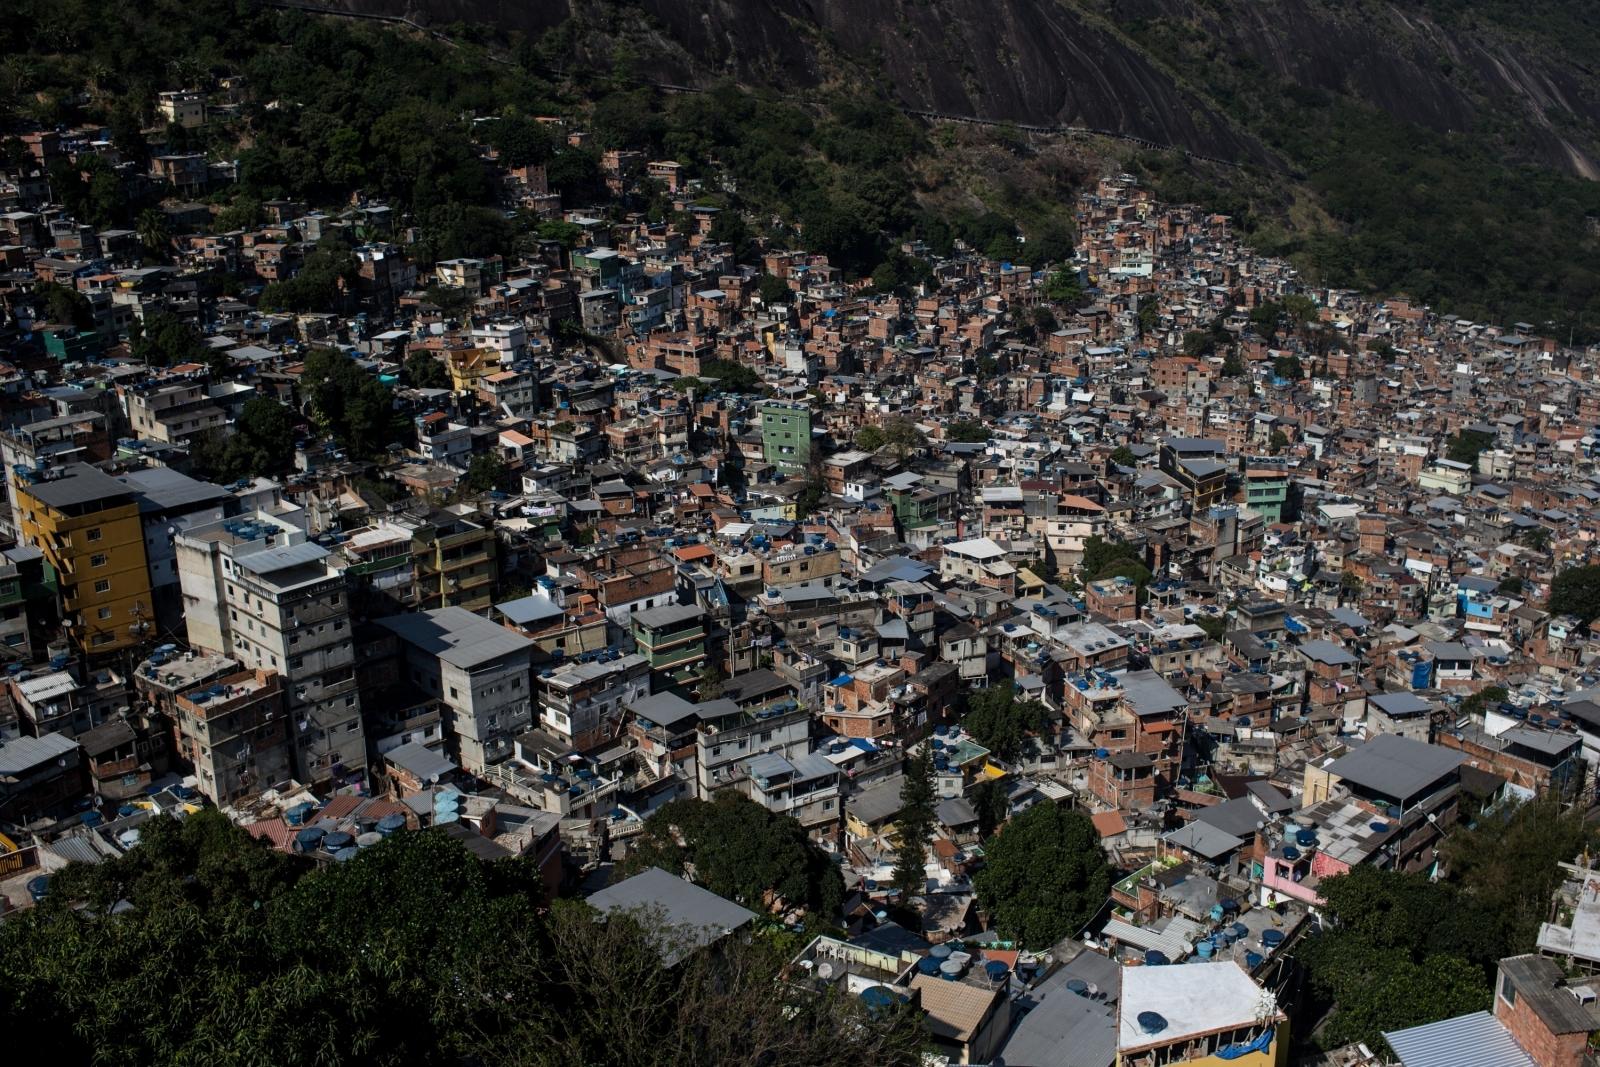 rochina favela rio de janiro brazil